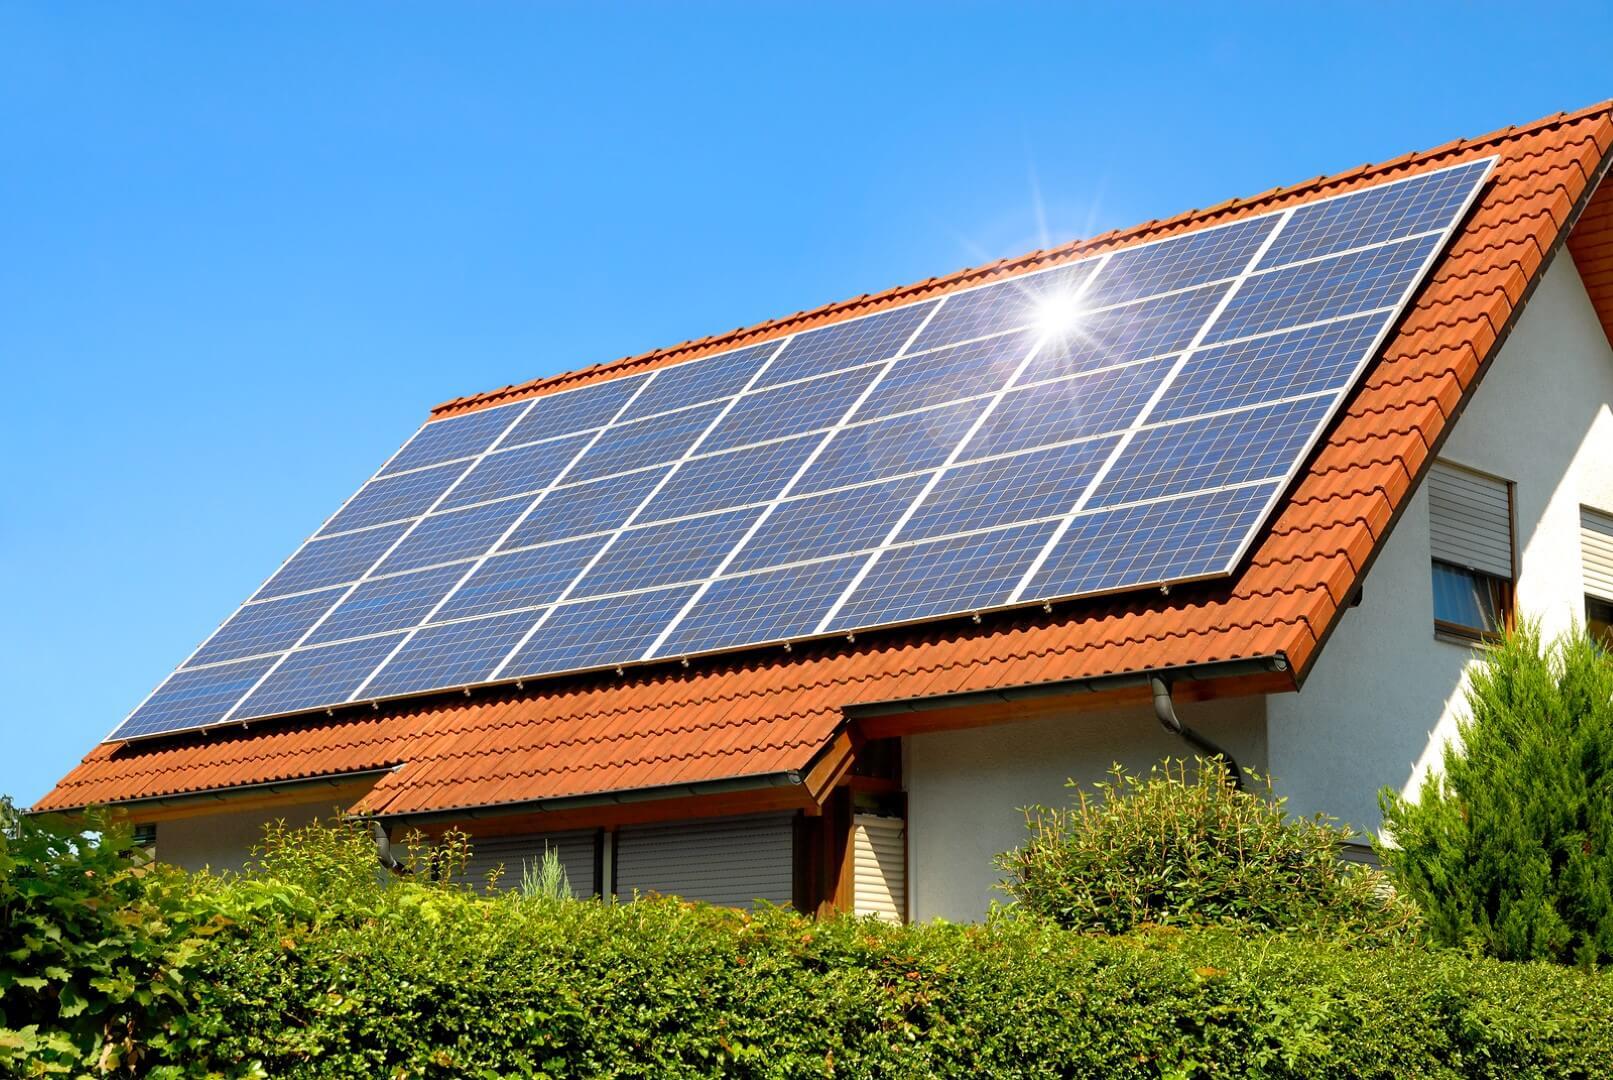 Солнечные батареи преимущества и недостатки